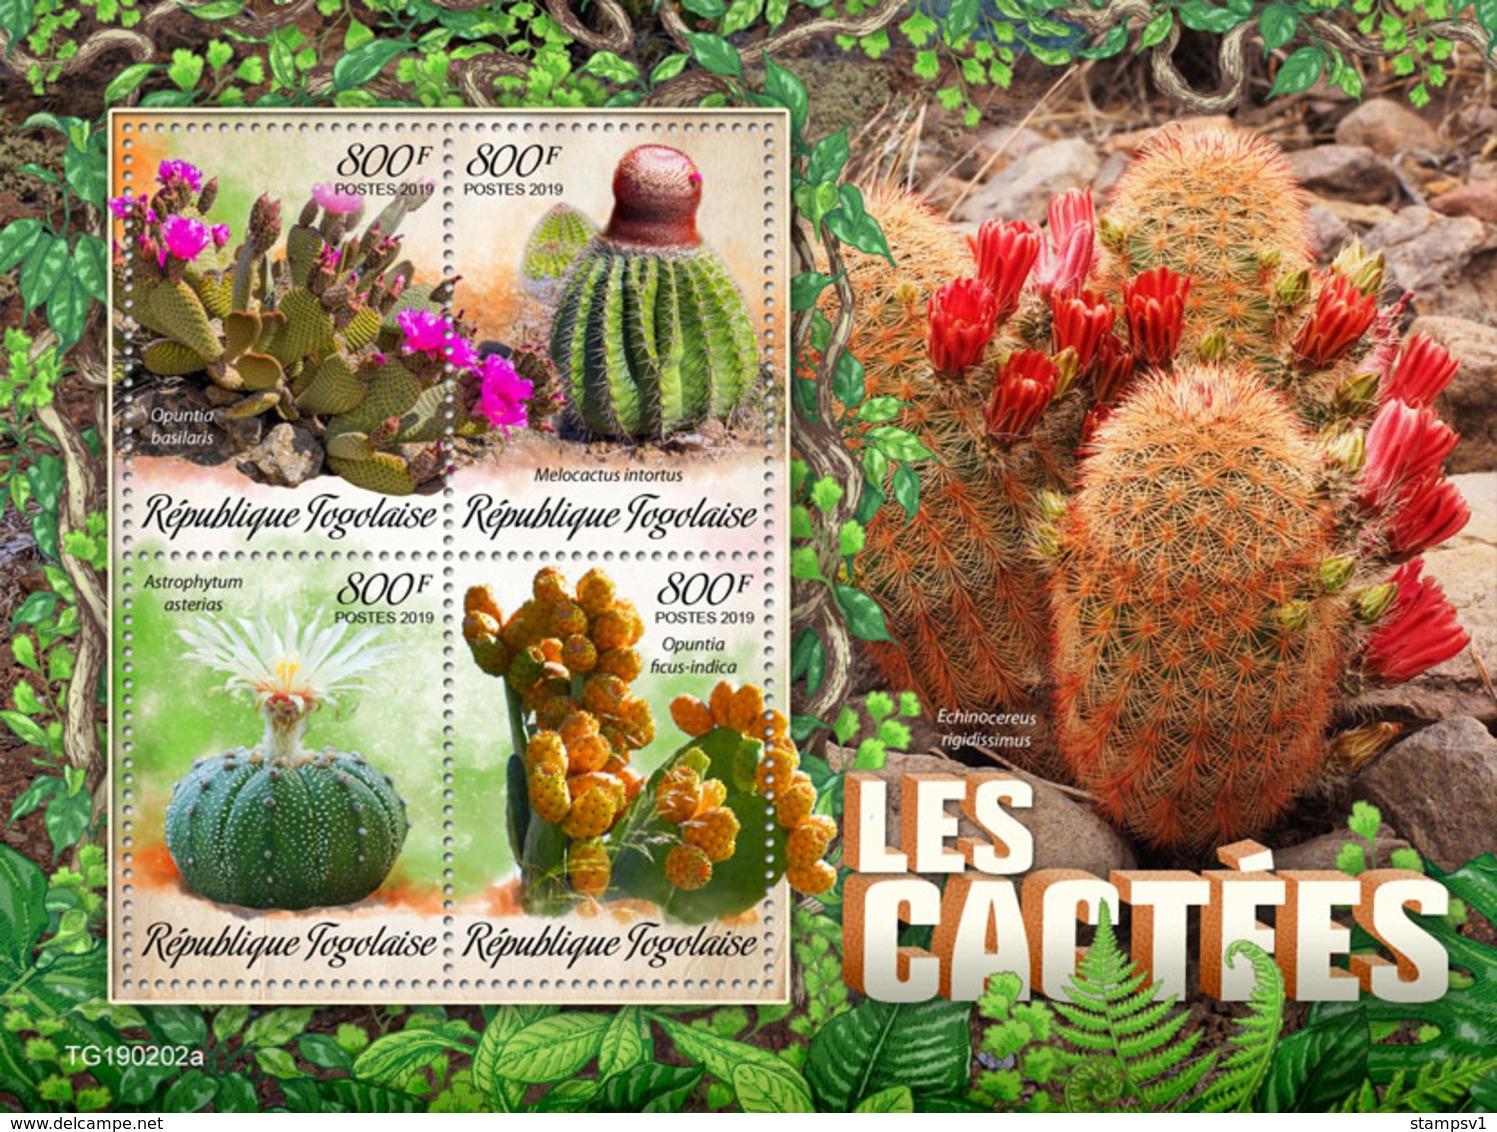 Togo.  2019 Cactus. (0202a)  OFFICIAL ISSUE - Sukkulenten